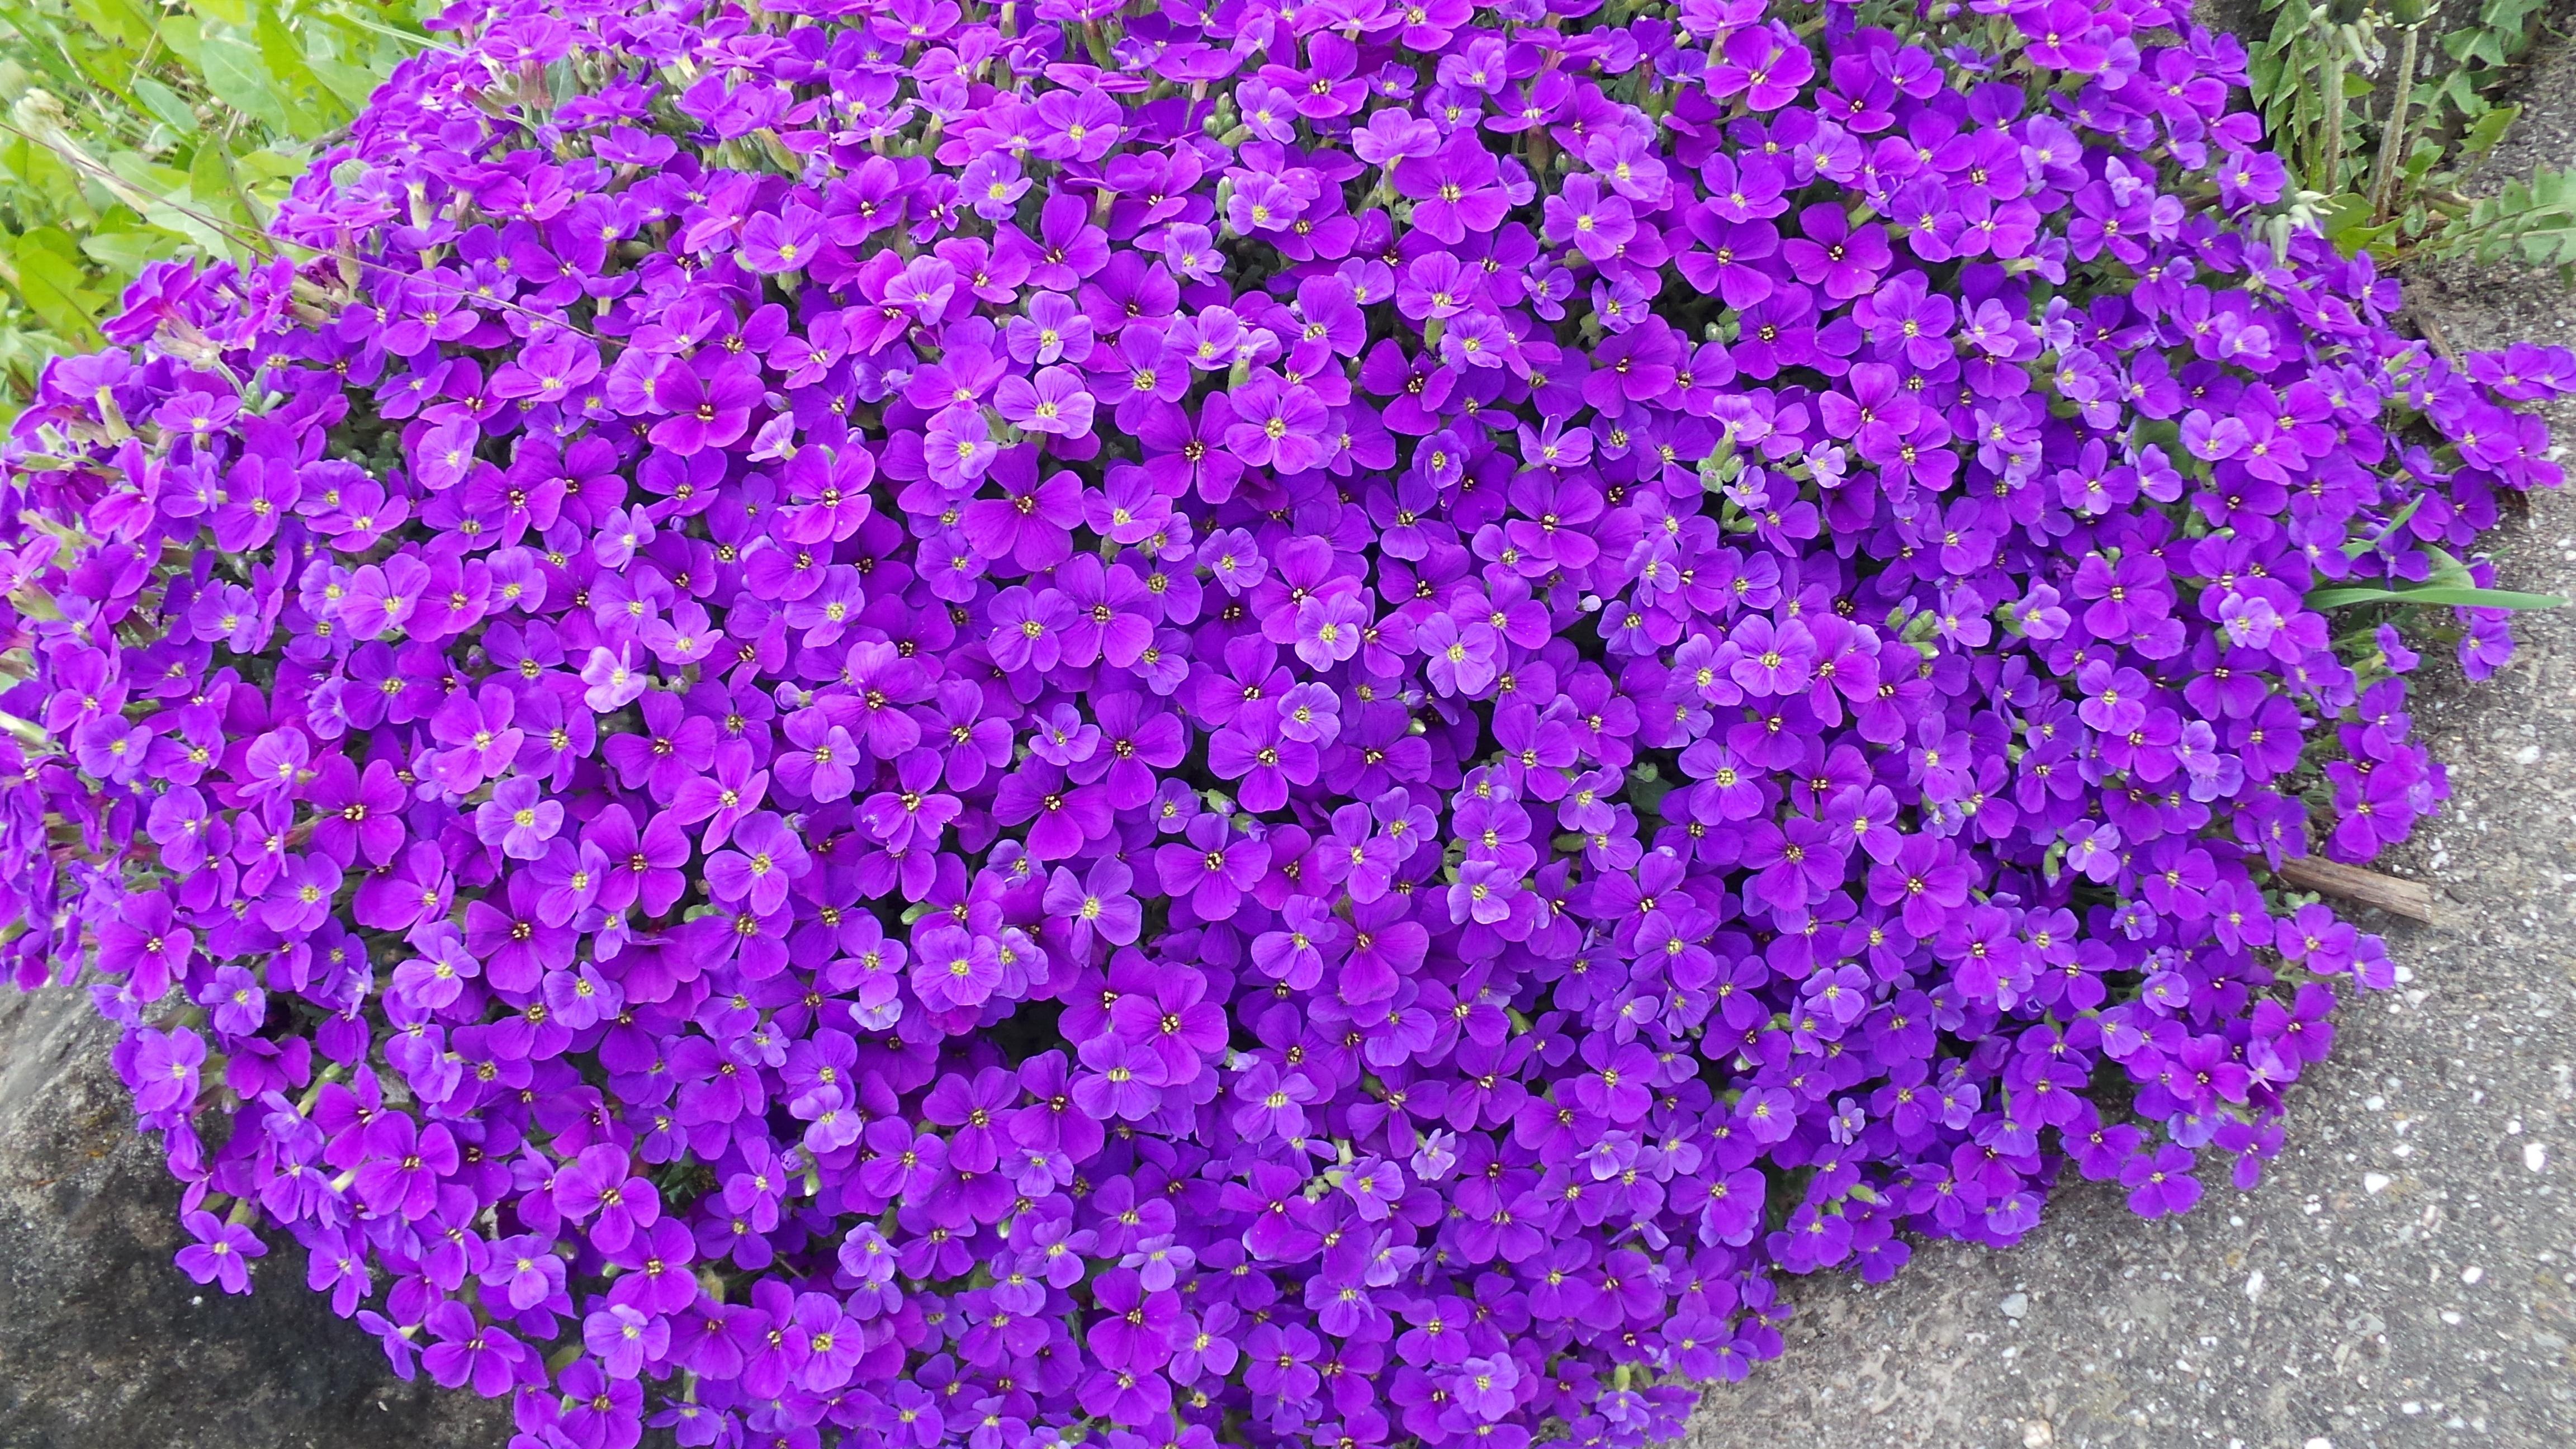 kostenlose foto bl hen blume lila fr hling schlie en strauch violett bodenbedeckung. Black Bedroom Furniture Sets. Home Design Ideas